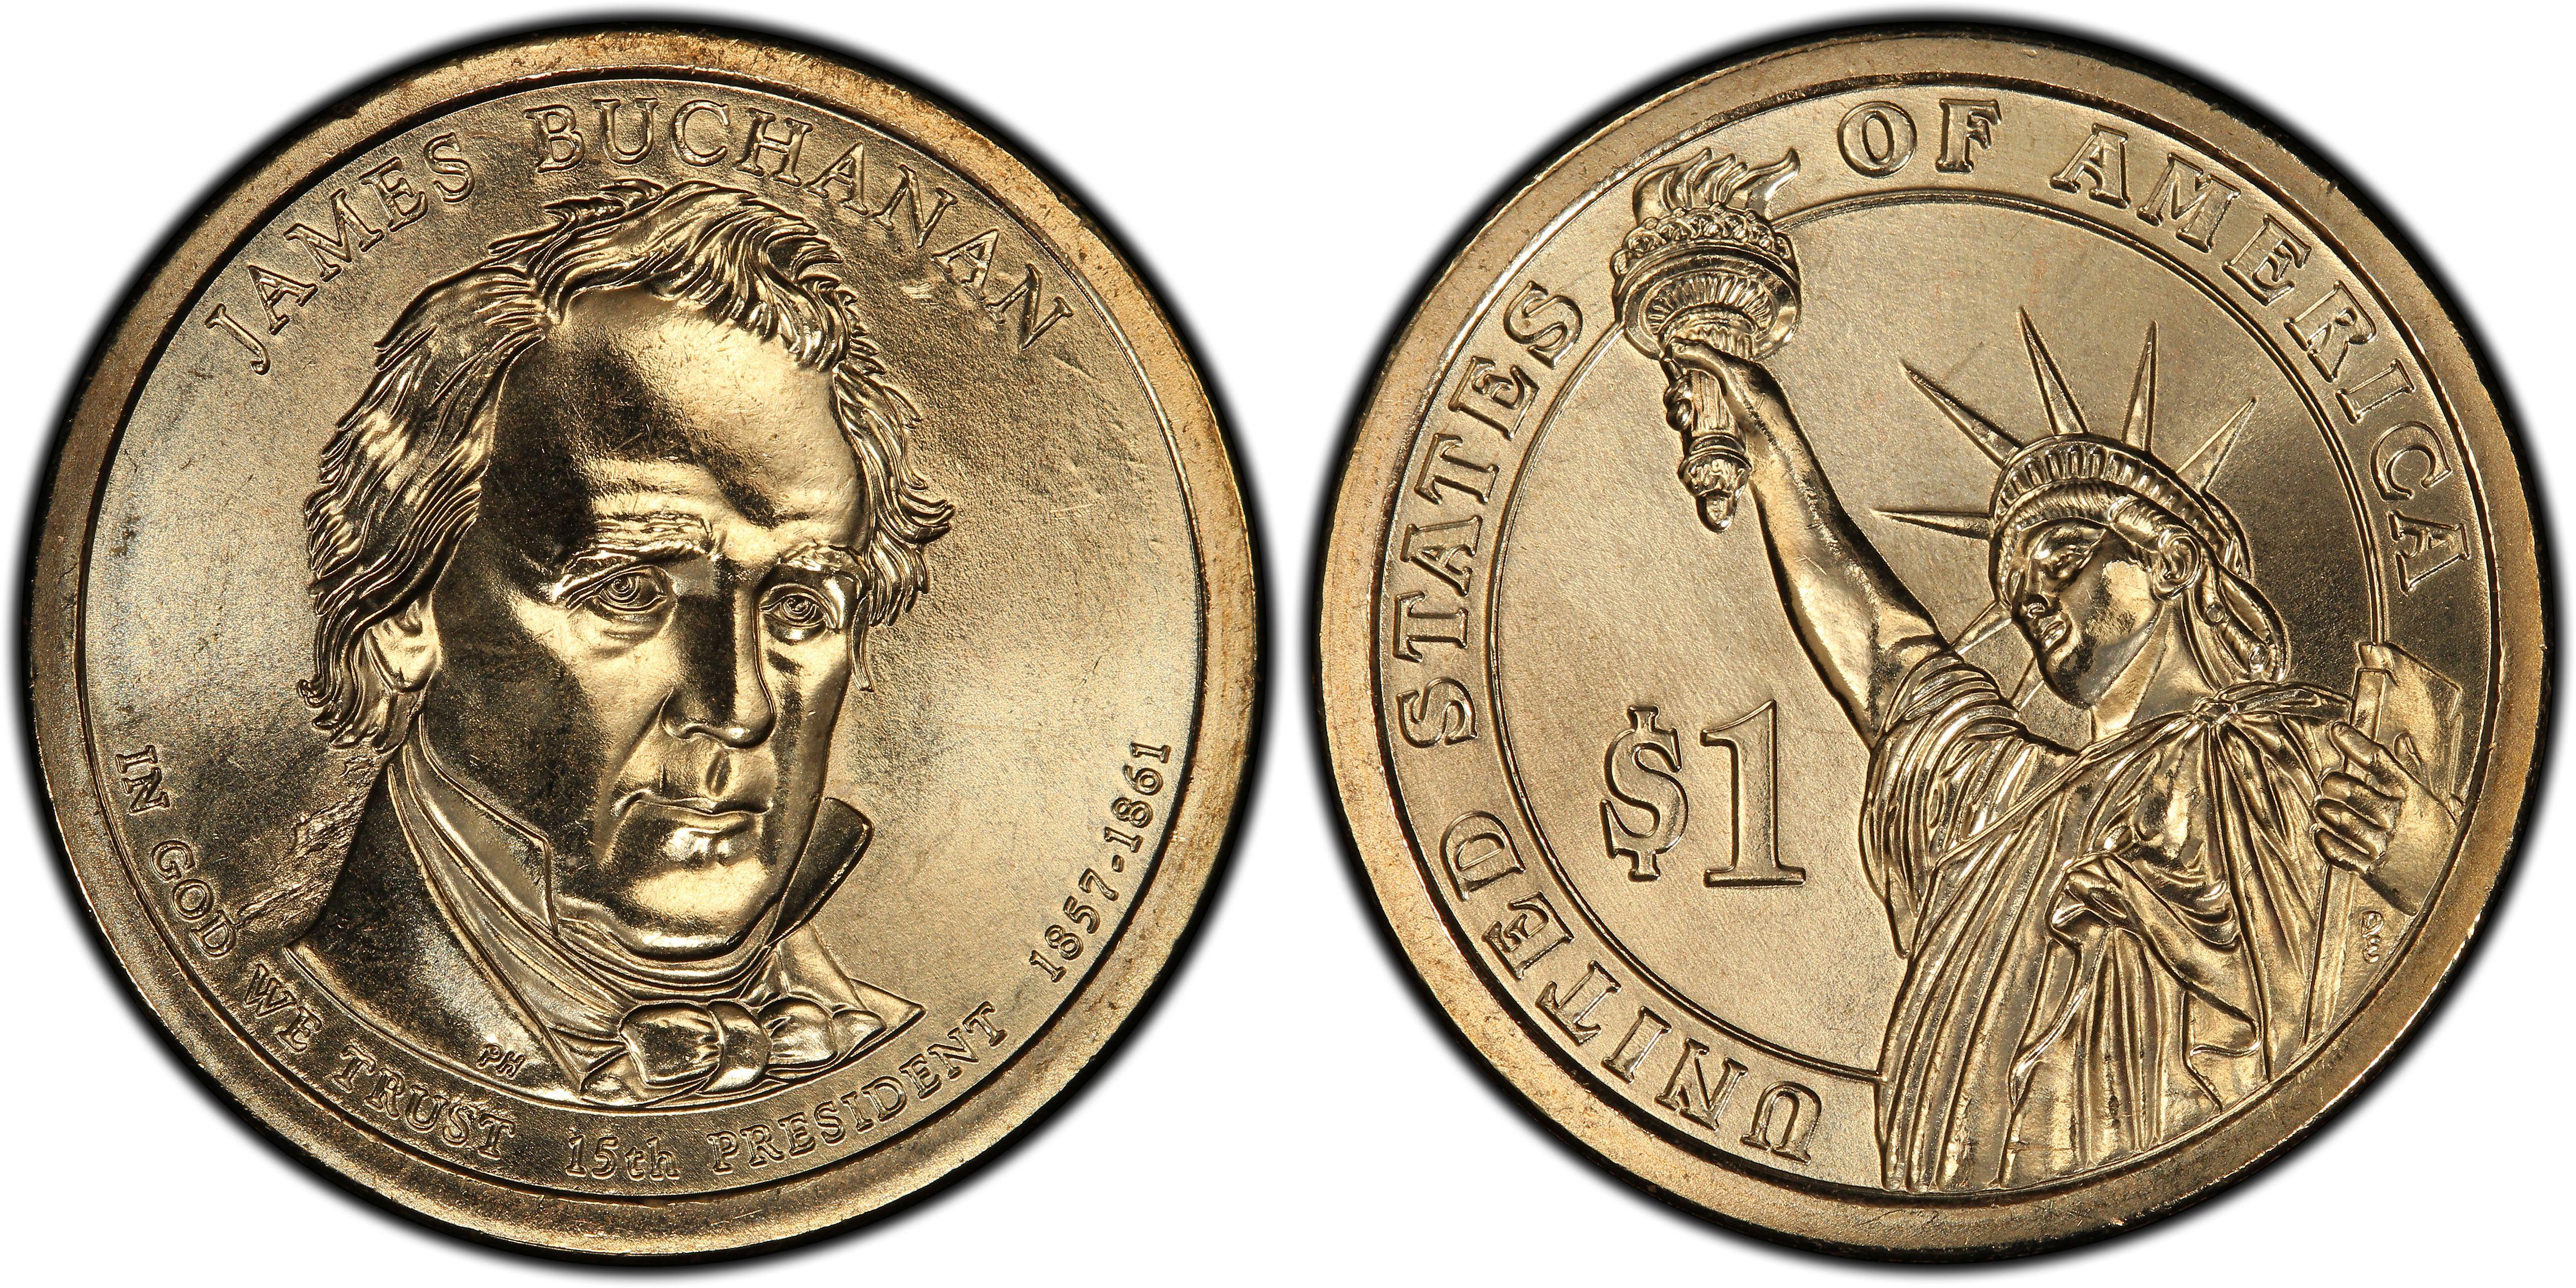 2010 US Presidential Dollar Coin James Buchanan P in BU Condition